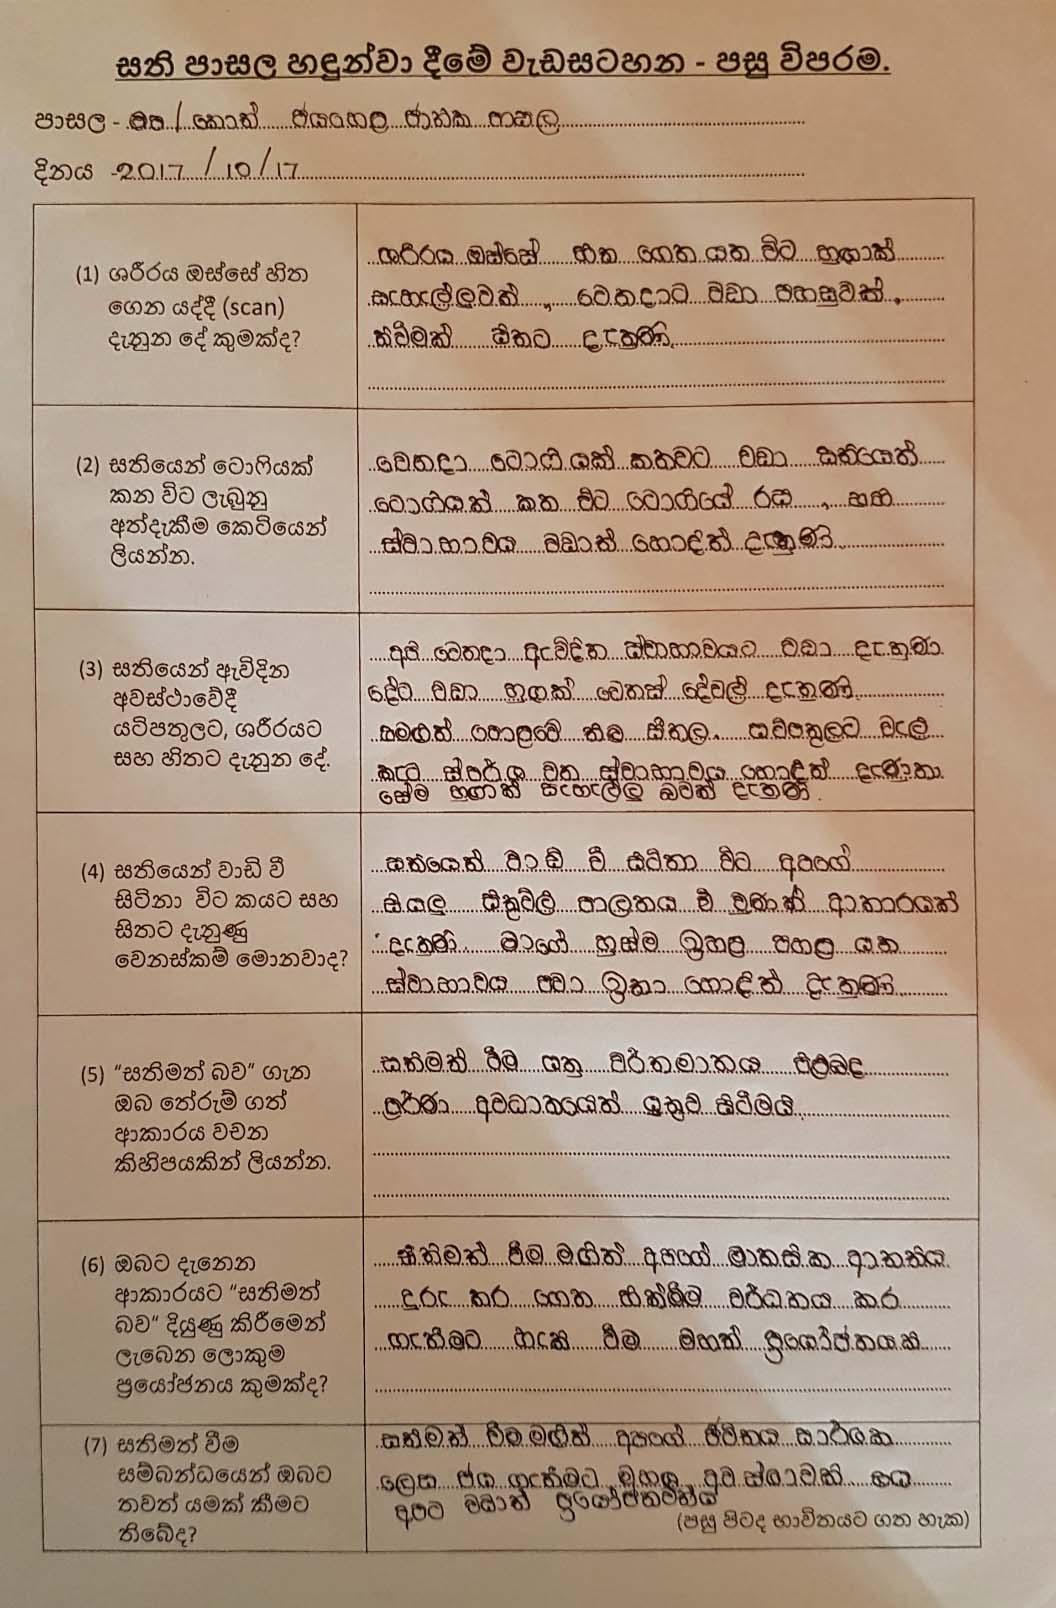 Feedback-Sati Pasala Introductory Program at JayahelaJathika Pasala, Pundaluoya (2)